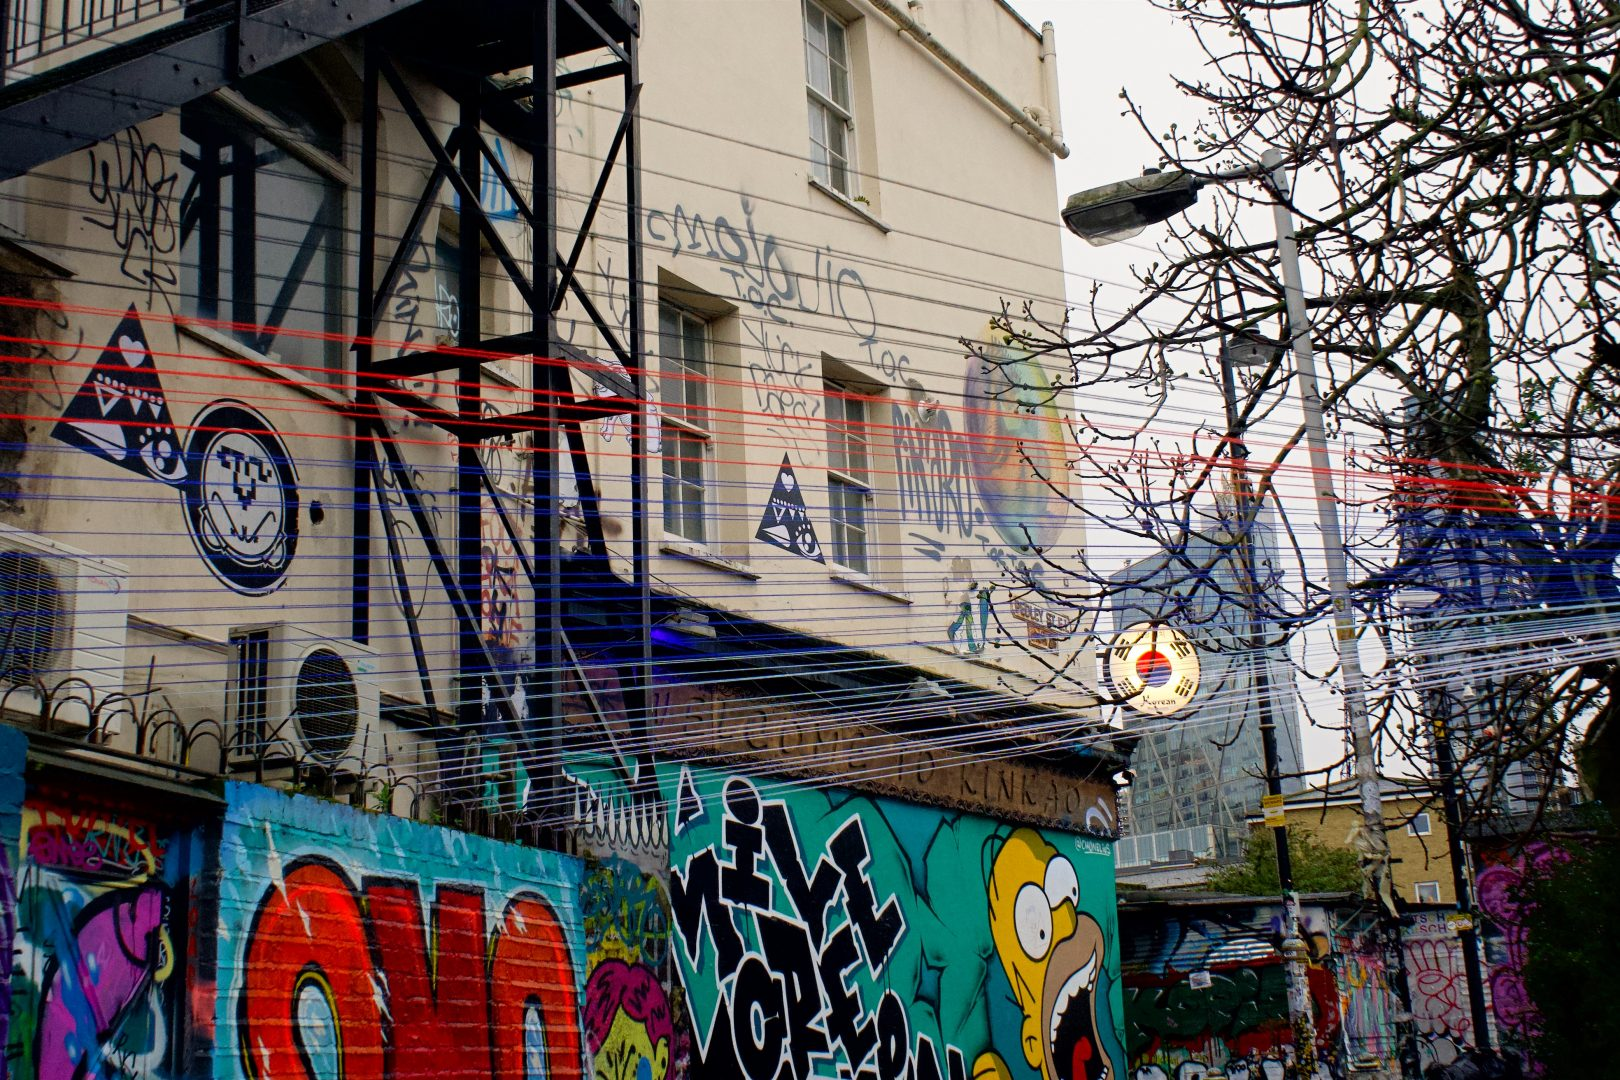 graffiti on wall near bare tree during daytime